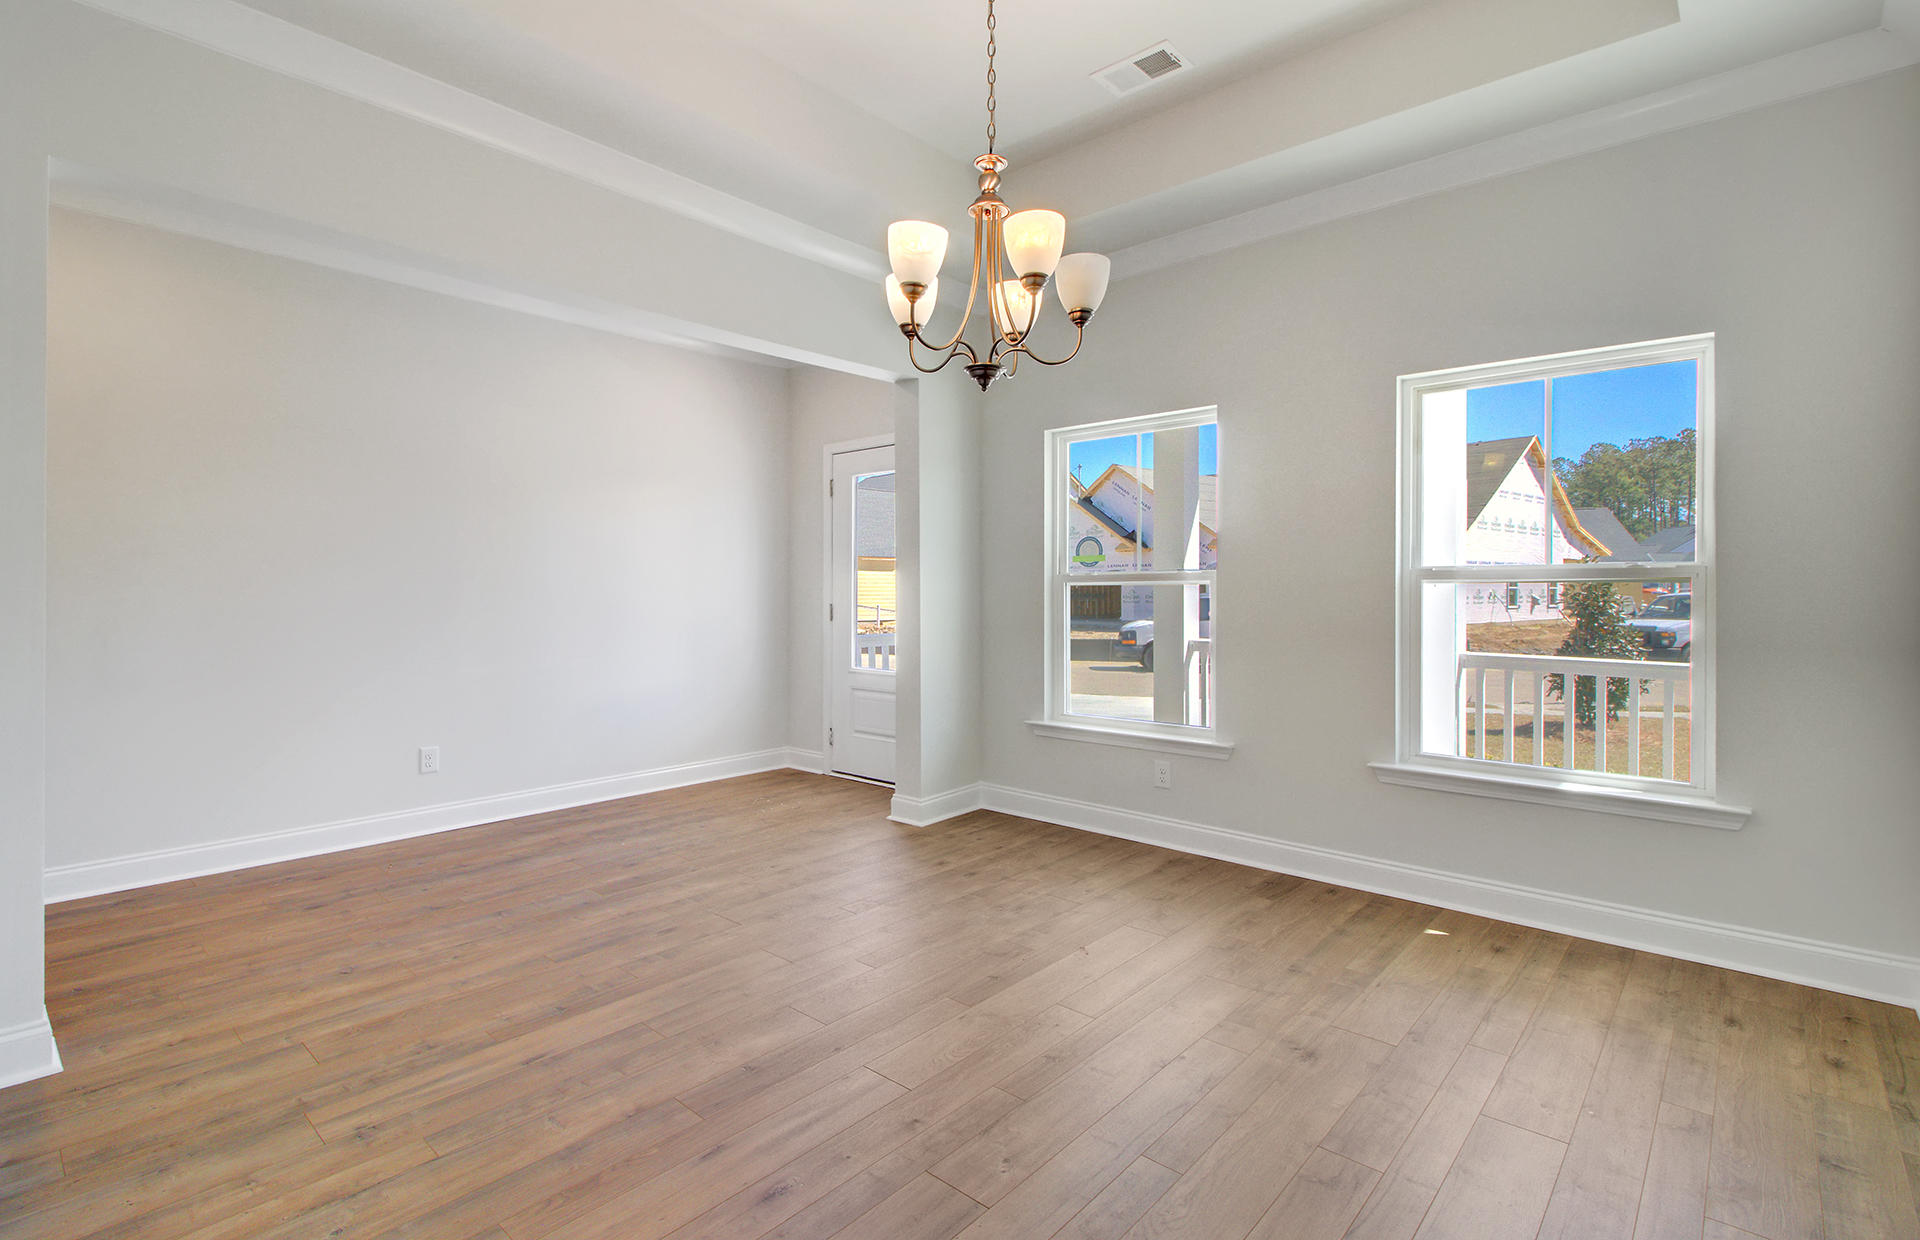 Park West Homes For Sale - 3062 Rice Field, Mount Pleasant, SC - 13